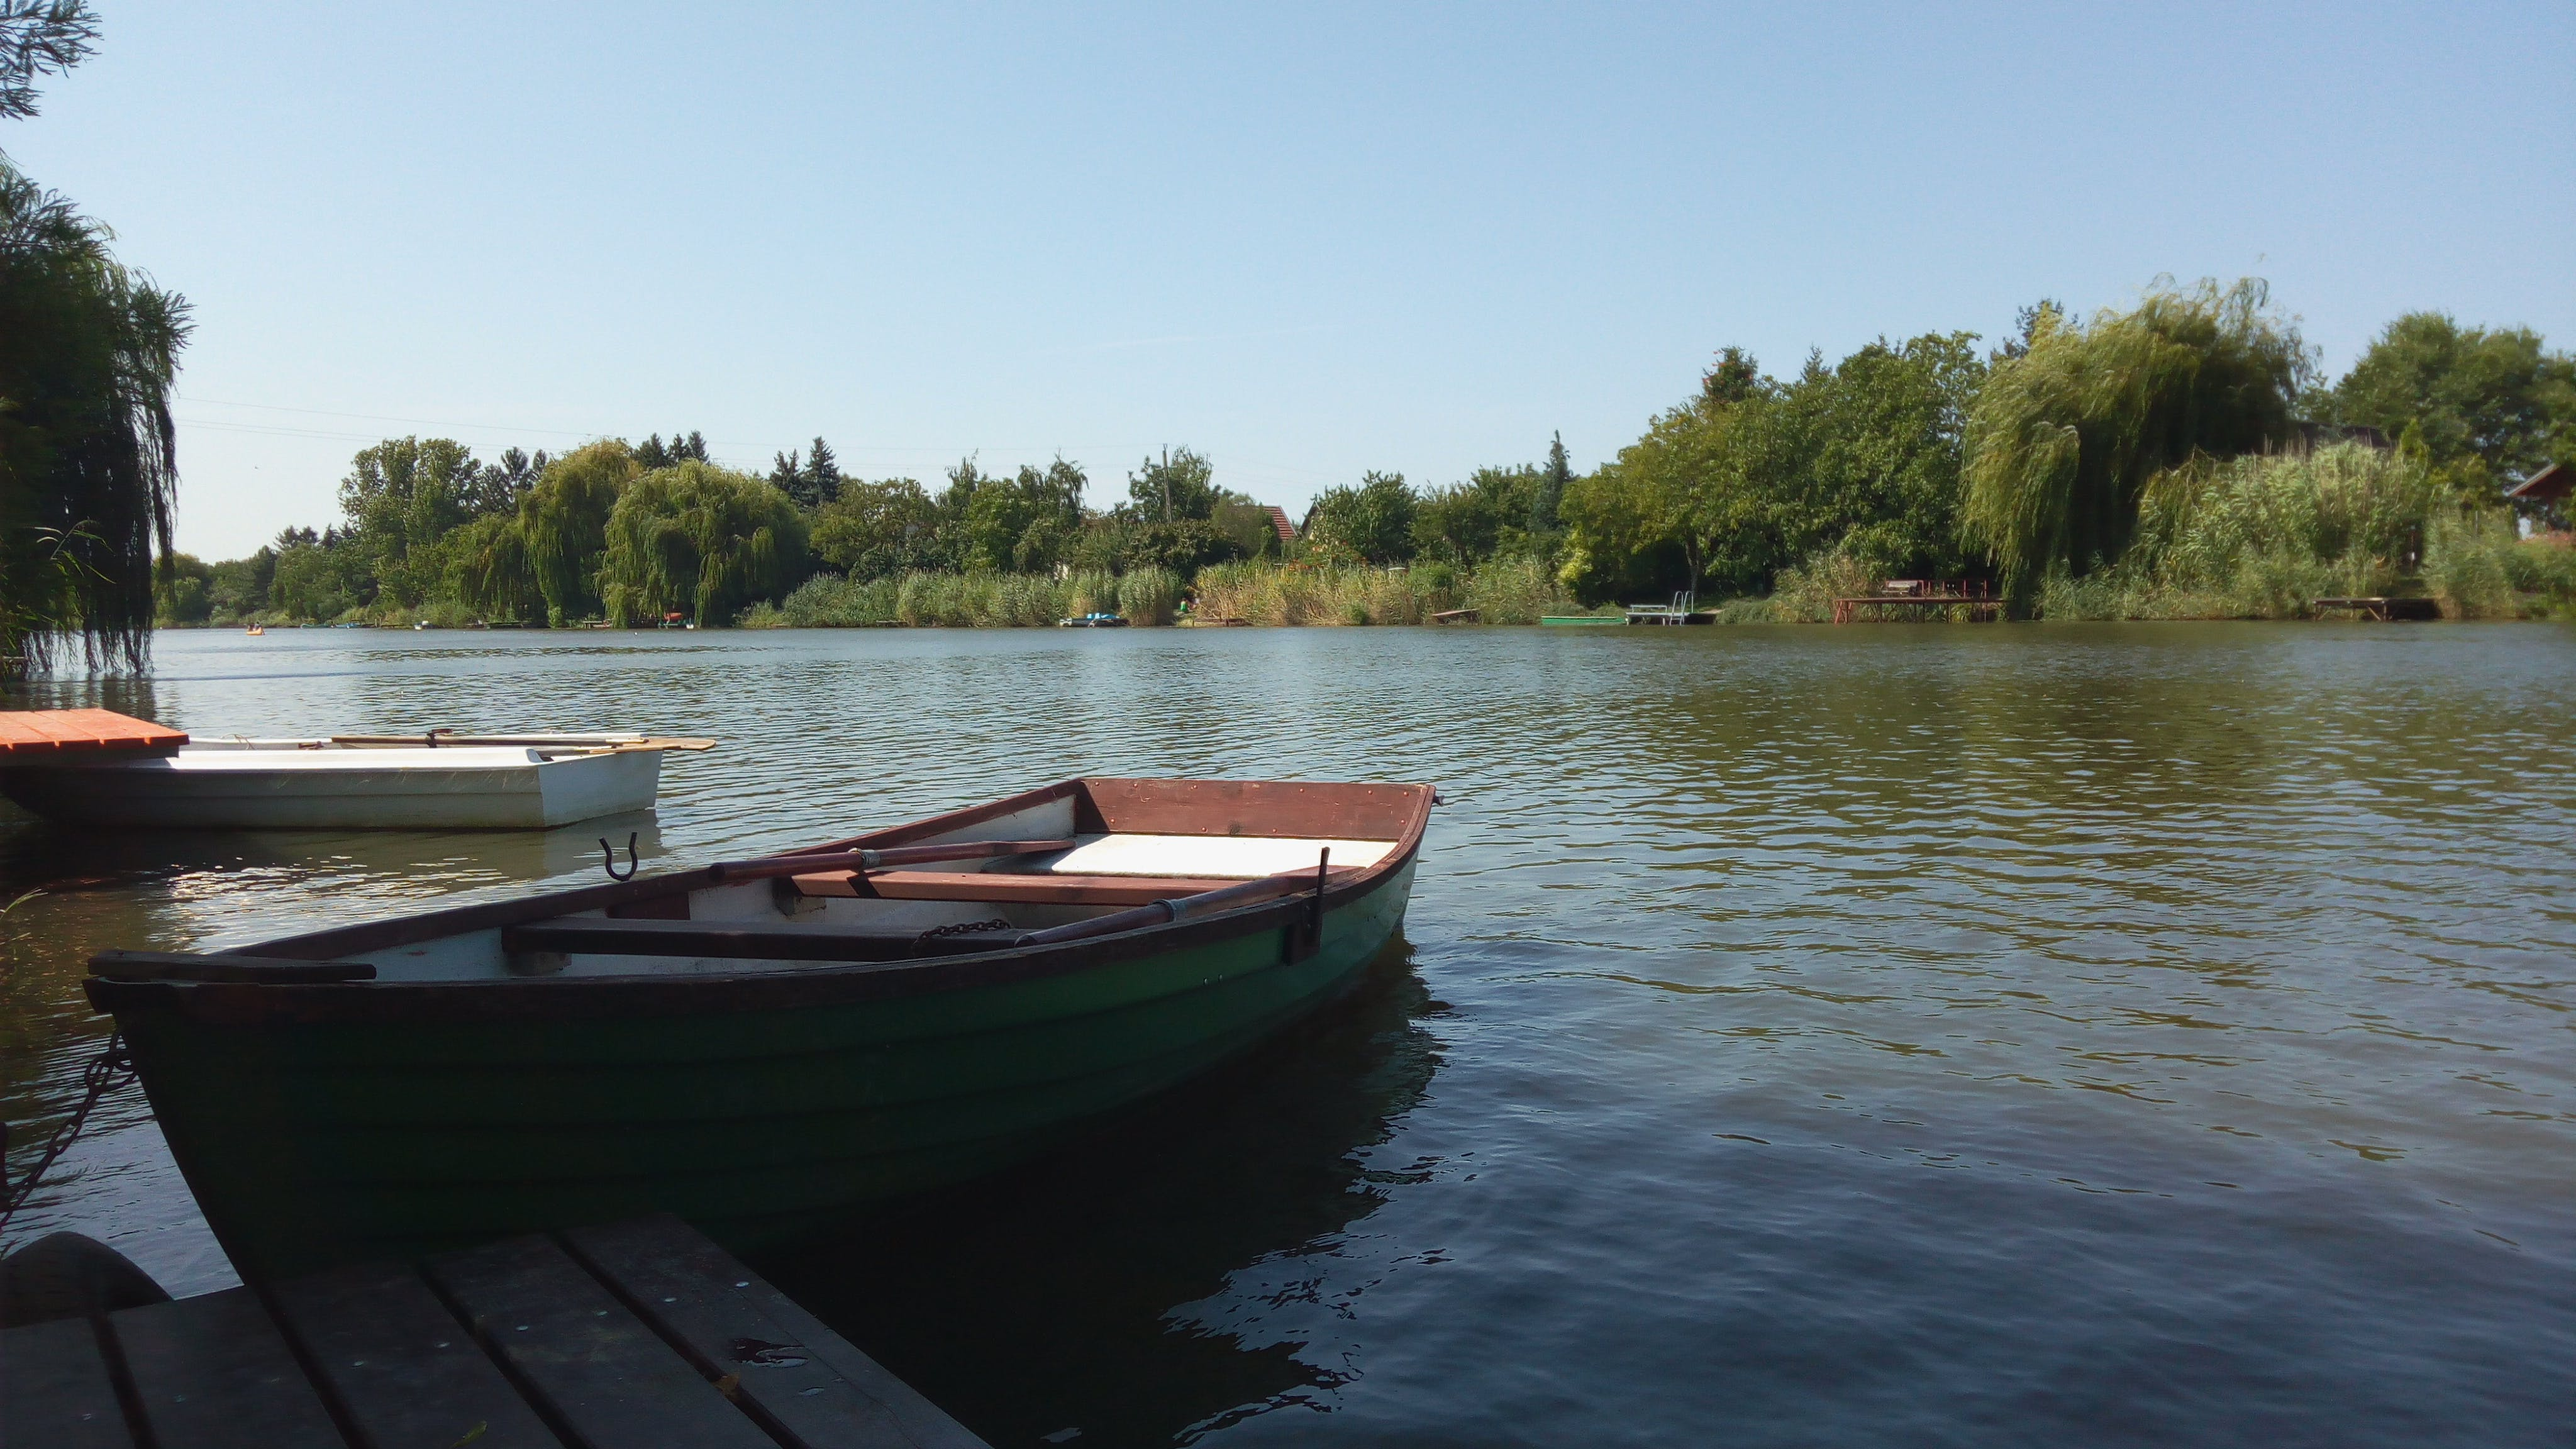 Free stock photo of boat, fishing boat, river, river bank